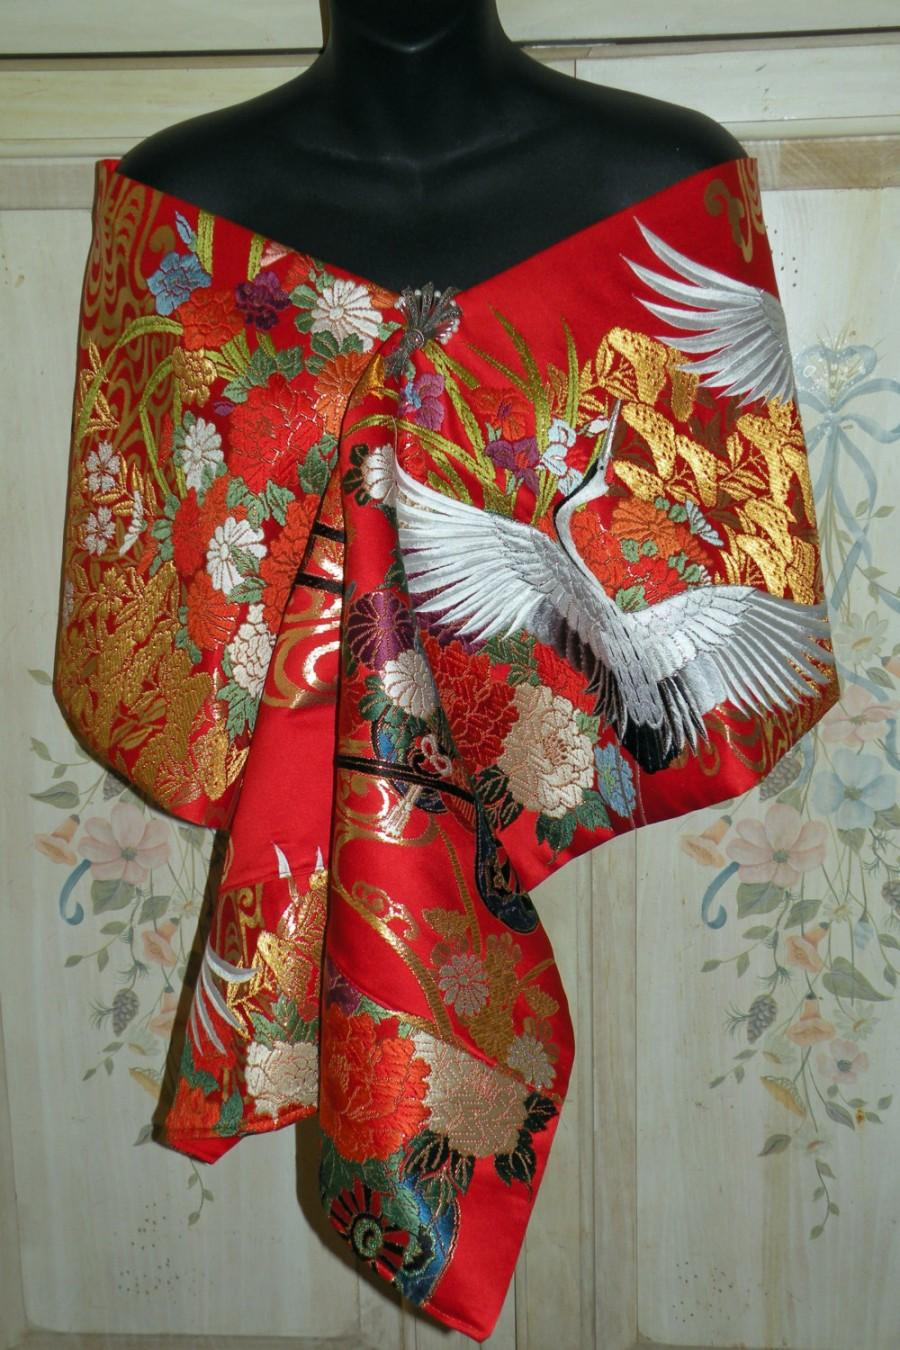 Wedding - Silk Kimono Fabric Bridal Wrap/Shawl/Shrug/Bolero.Wedding Gift.Embroidered Flying Ivory Cranes and Flower Carts..Red/Gold..Clutch/Purse/Bag